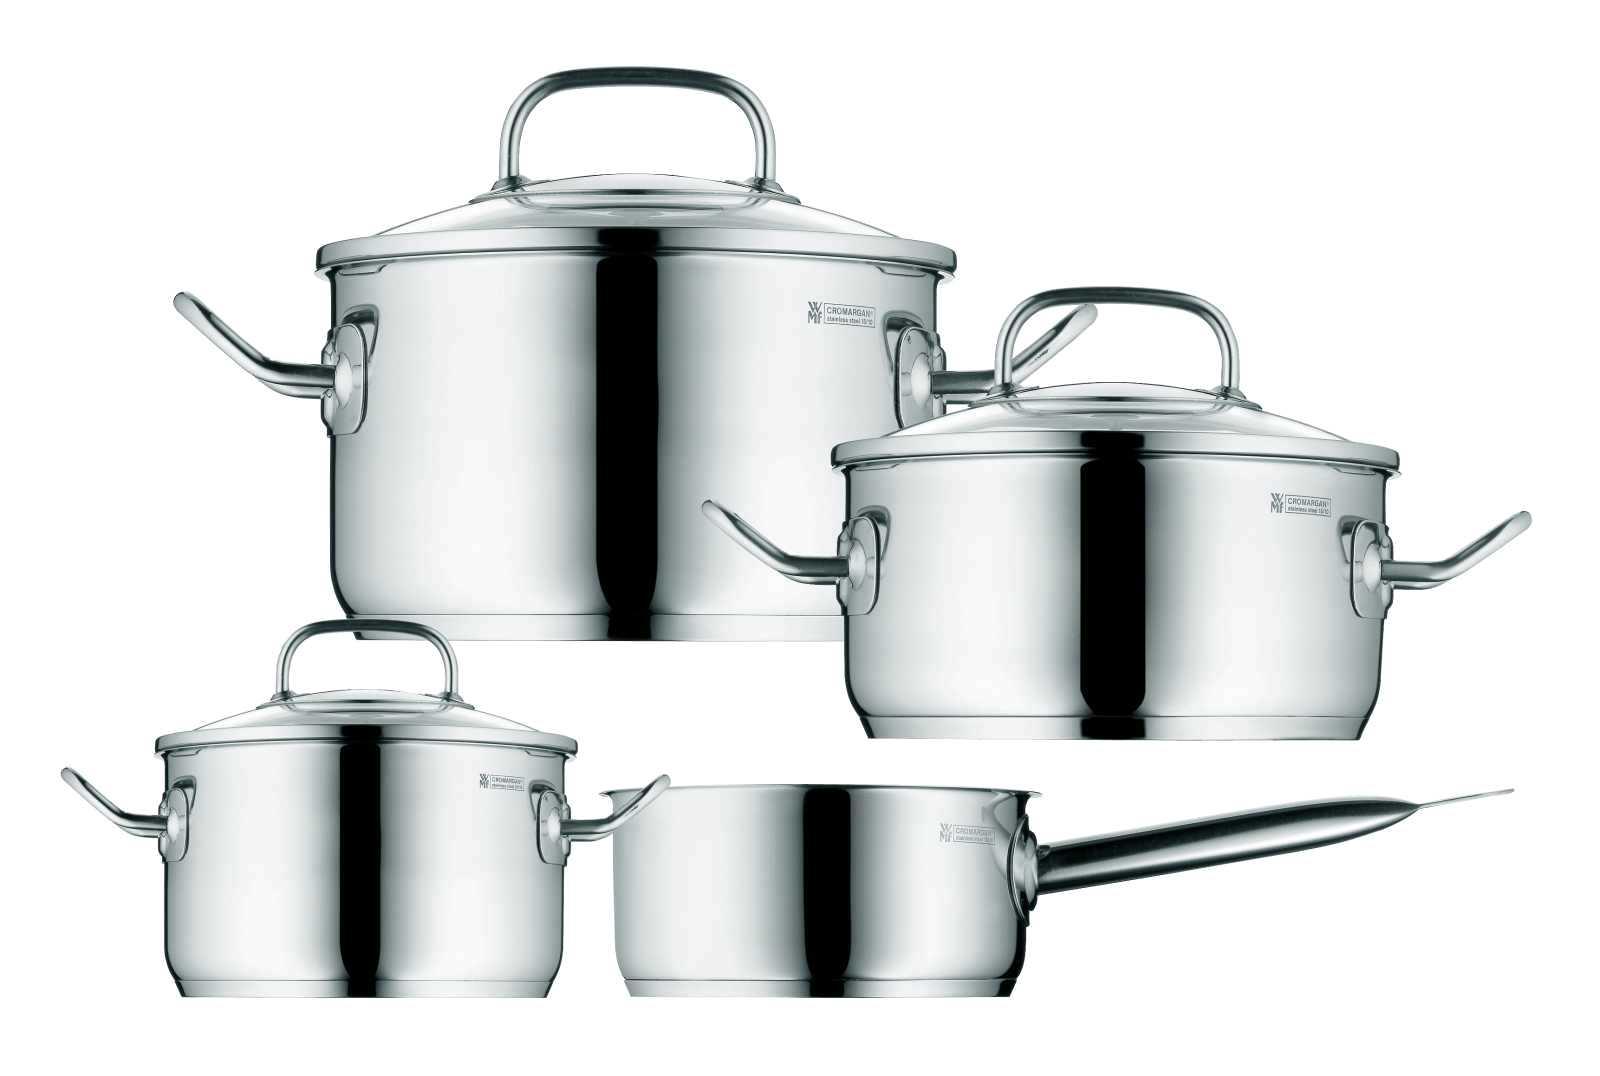 Онлайн каталог PROMENU: Набор кухонной посуды WMF PROFI PLUS, серебристый, 4 предмета WMF 07 1614 6380 PROMO